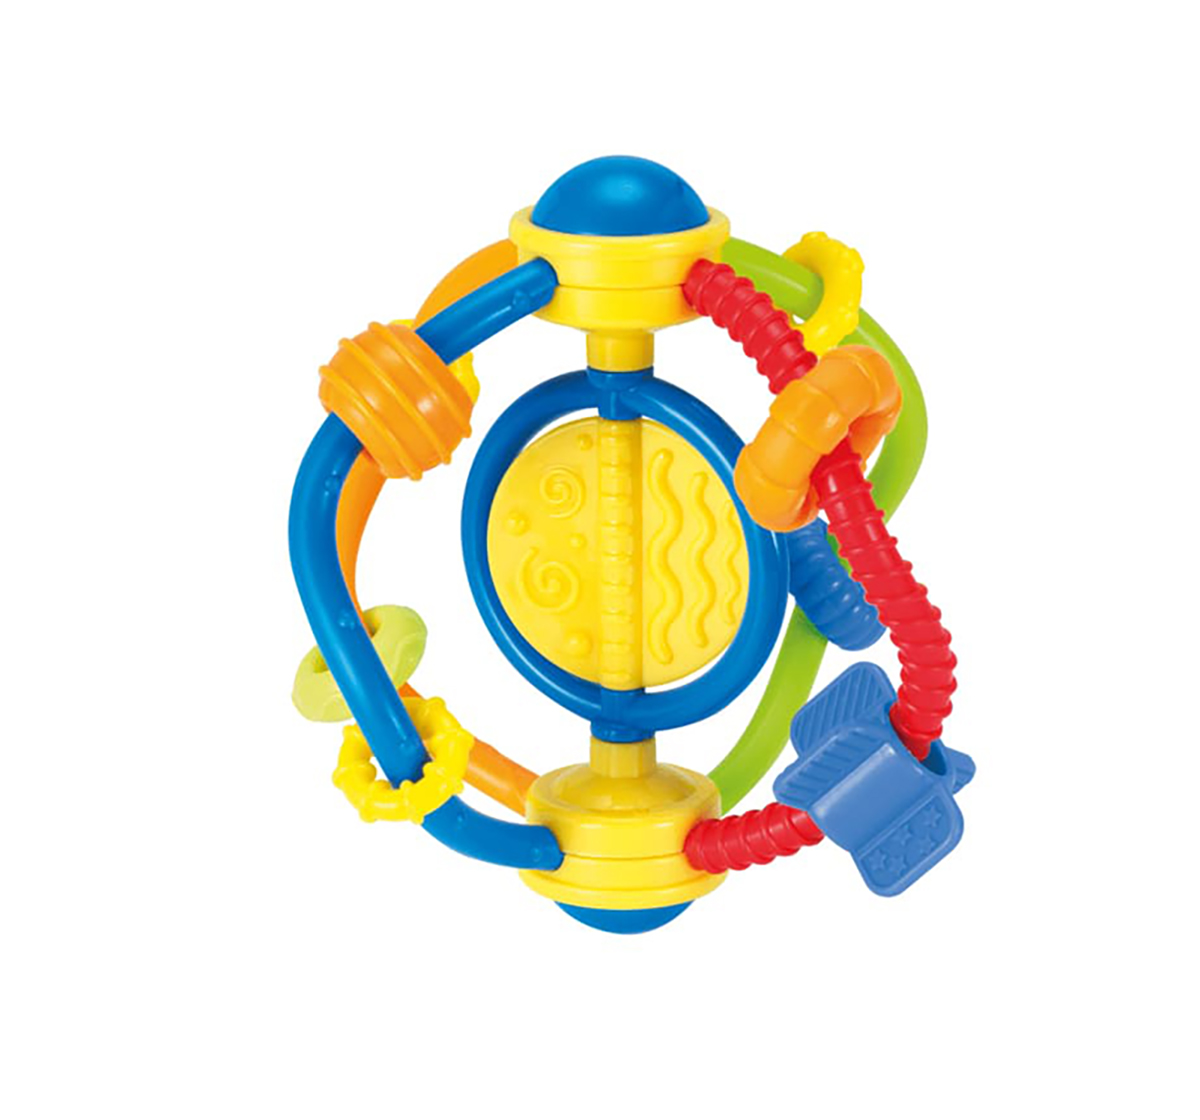 WinFun | Winfun grip n play rattle New Born for Kids age 0M+